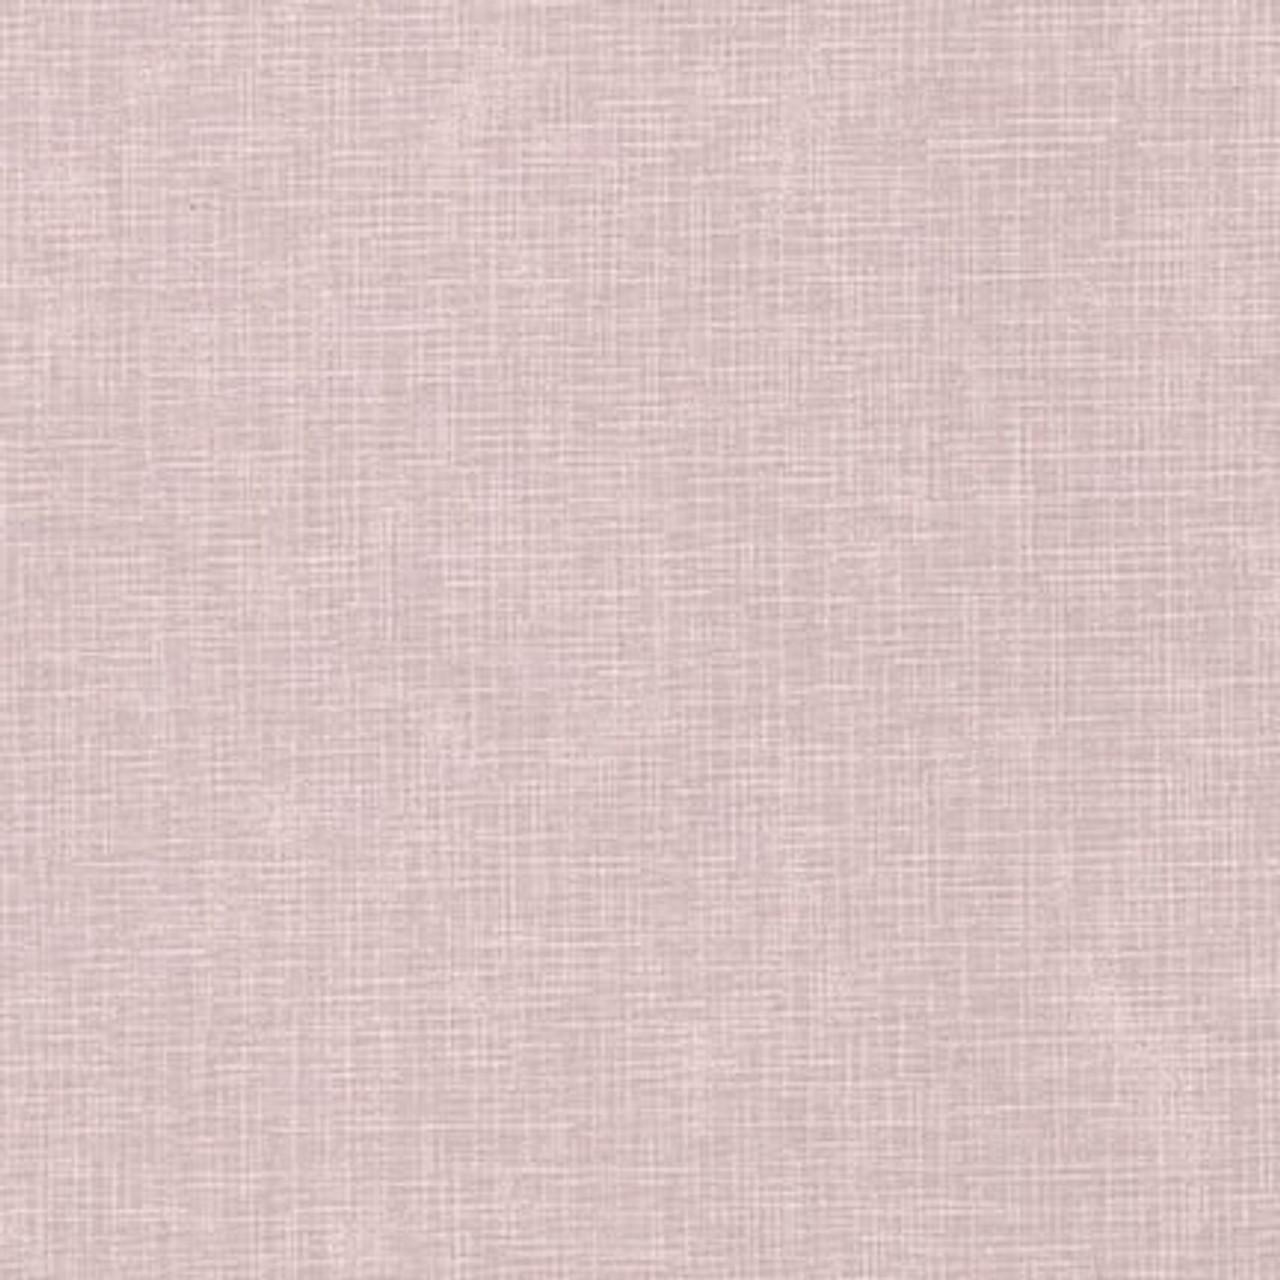 100% Cotton linen look - Iris